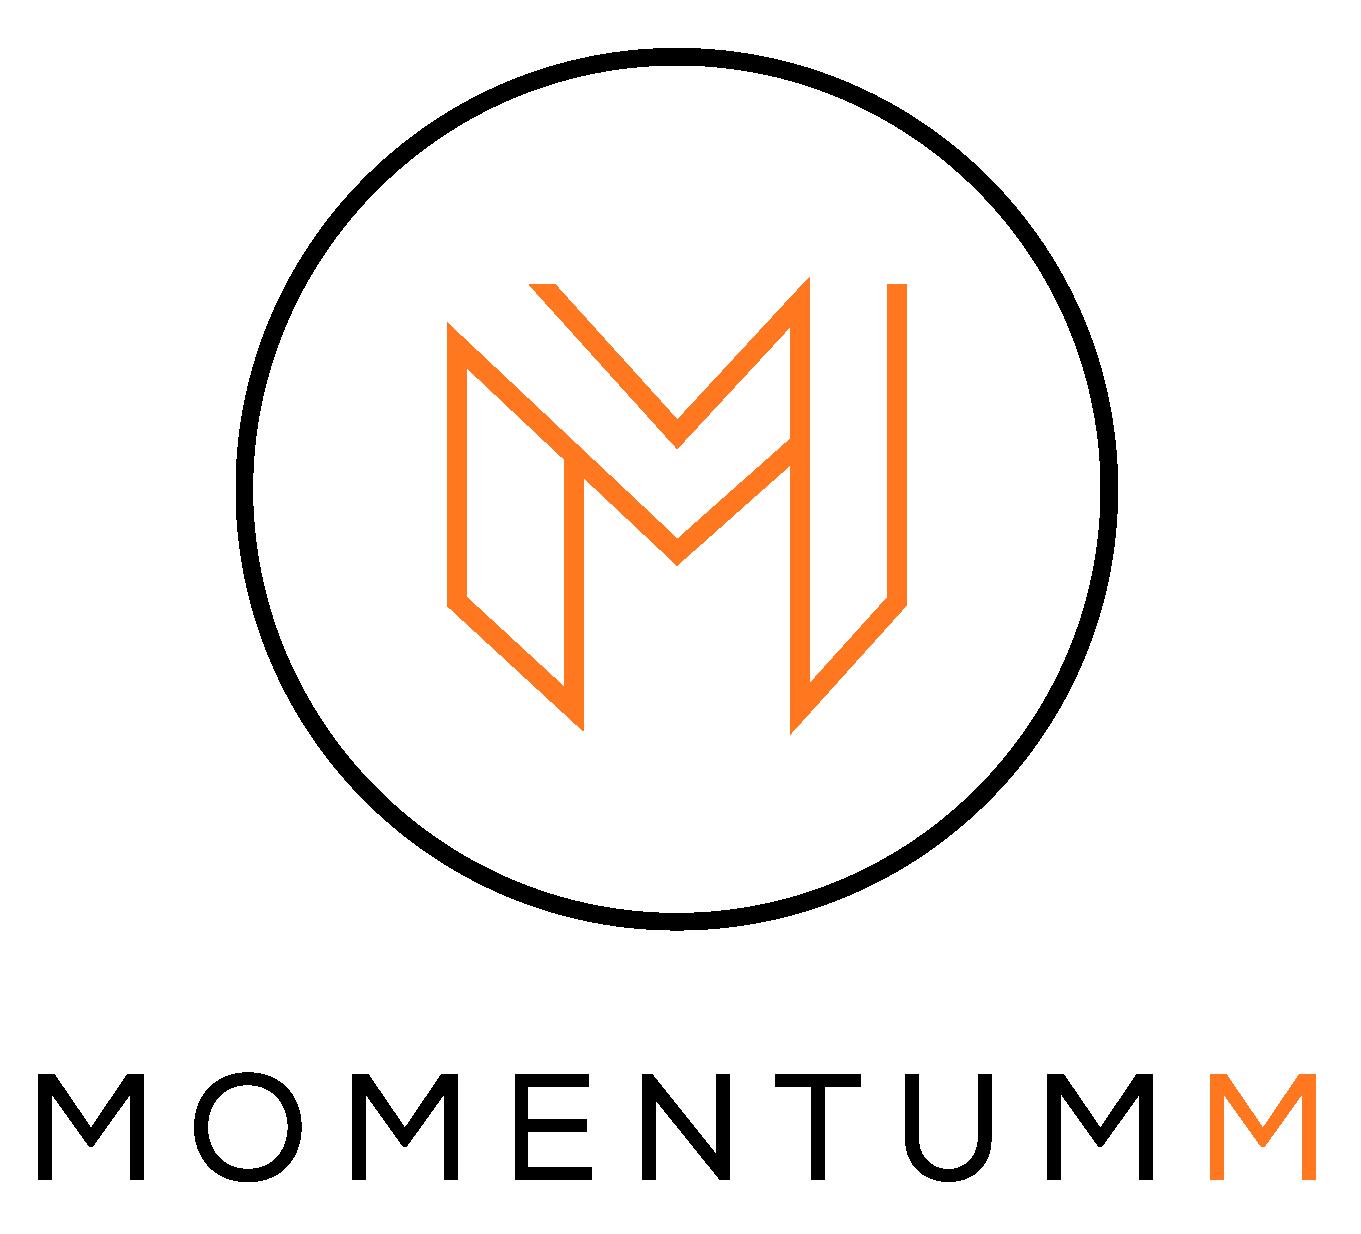 Momentumm Digital Logo